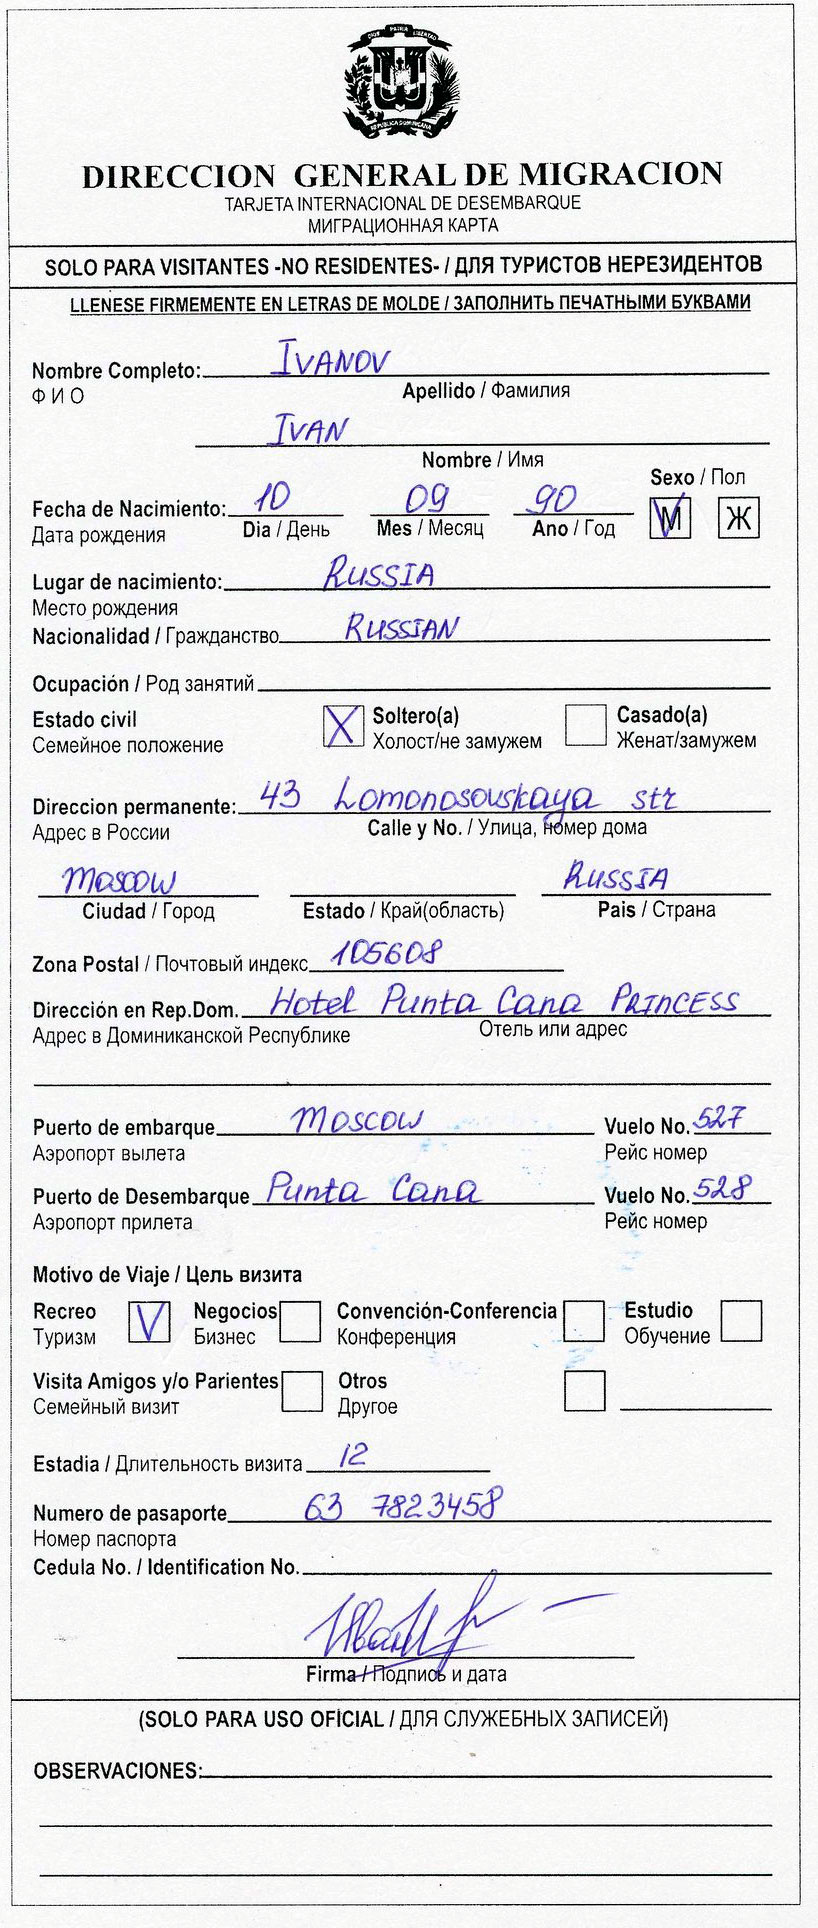 Доминикана виза нужна или нет